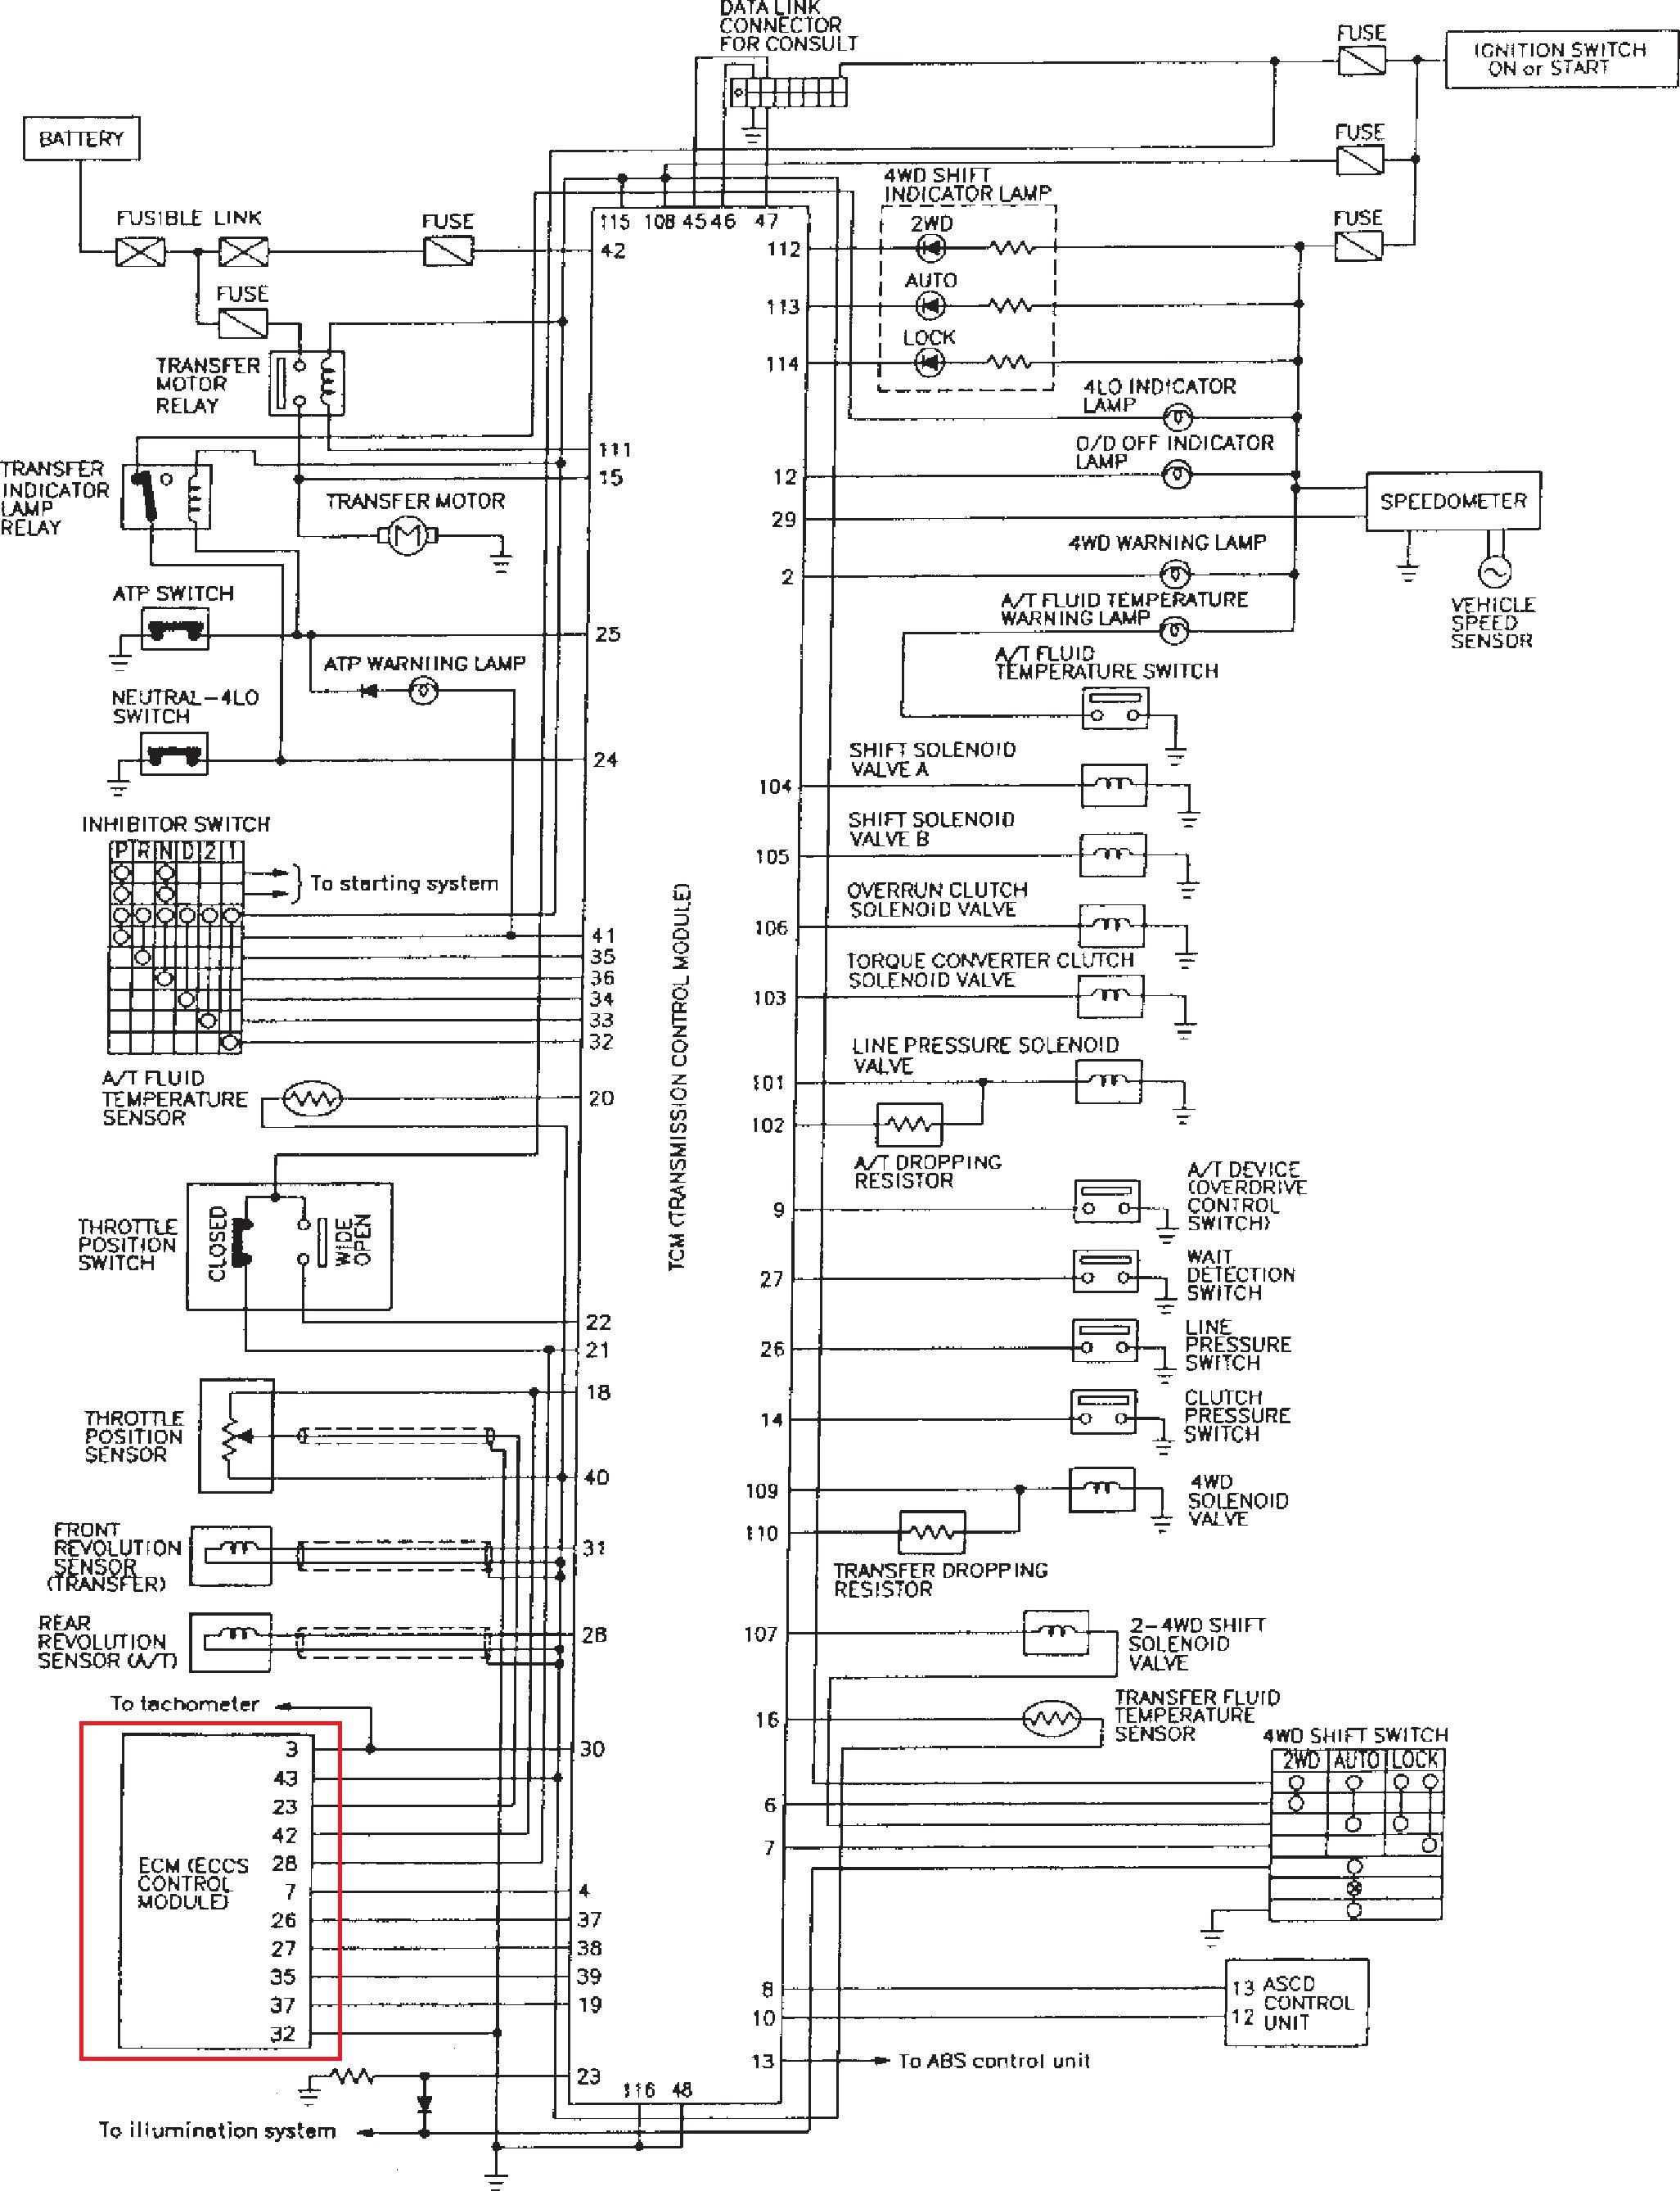 Wiring Diagram Jeep Grand Cherokee Zj - Wiring Diagram Schemas